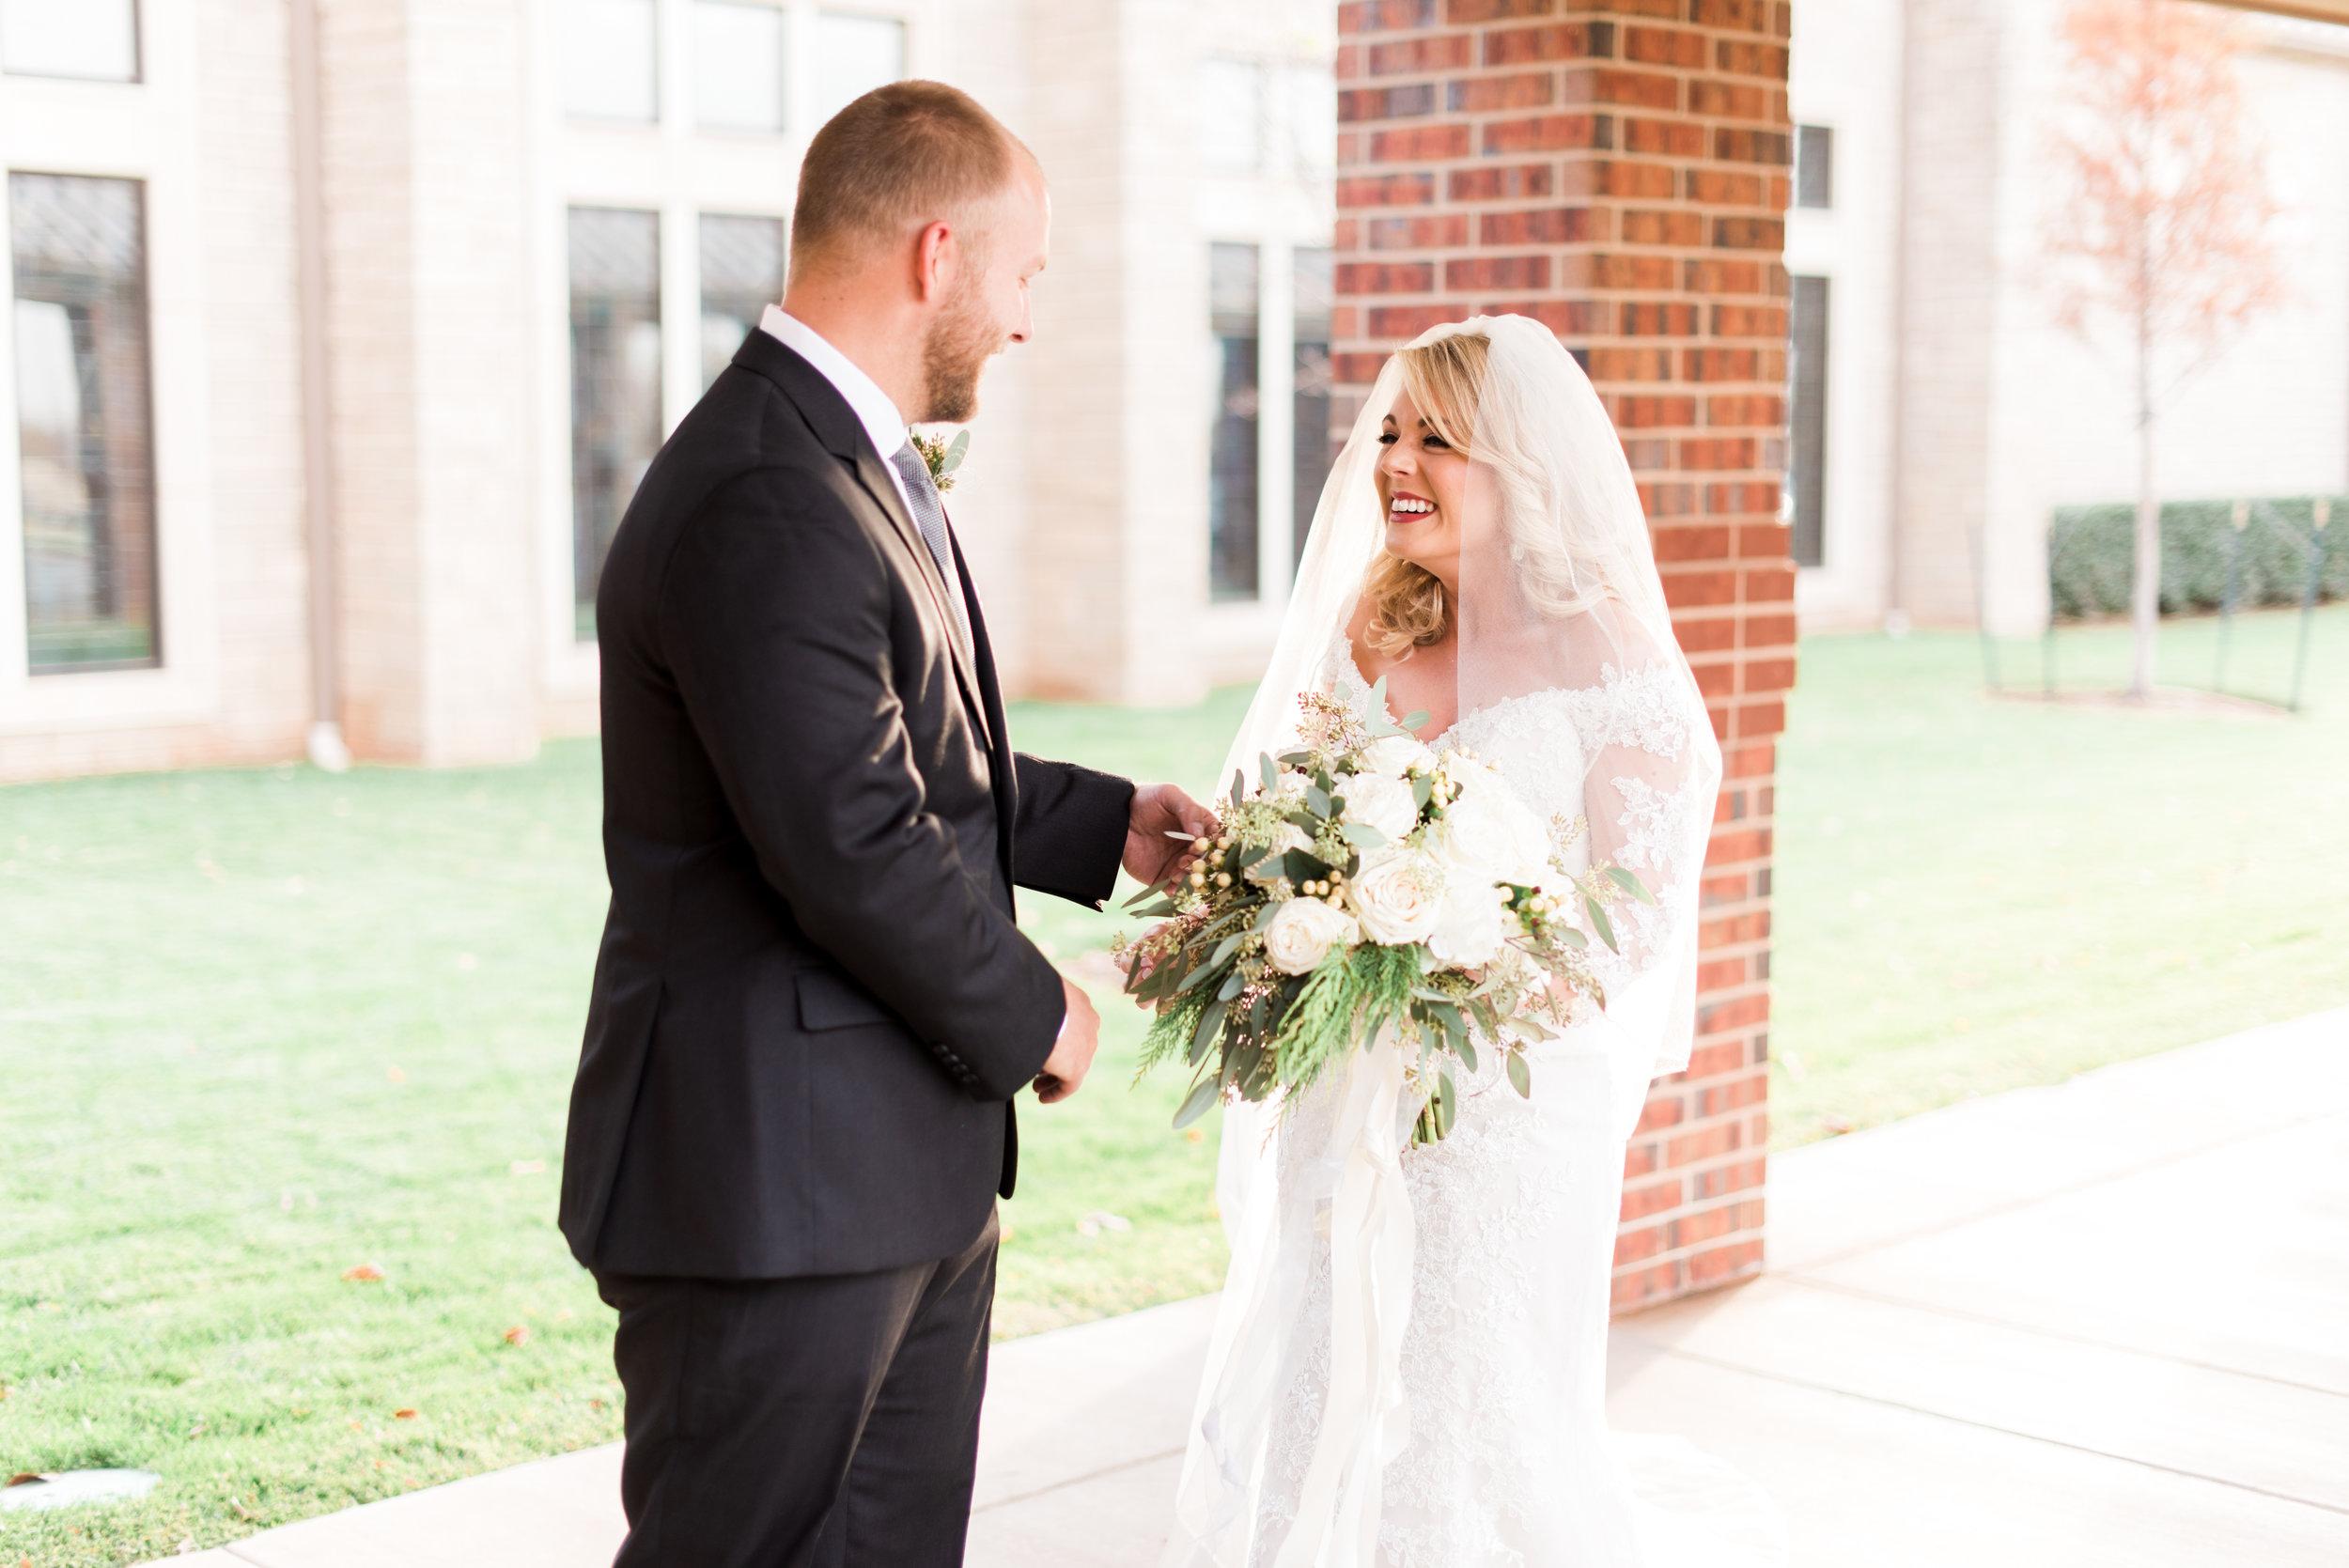 Magnolia Adams Photography | Wedding Day